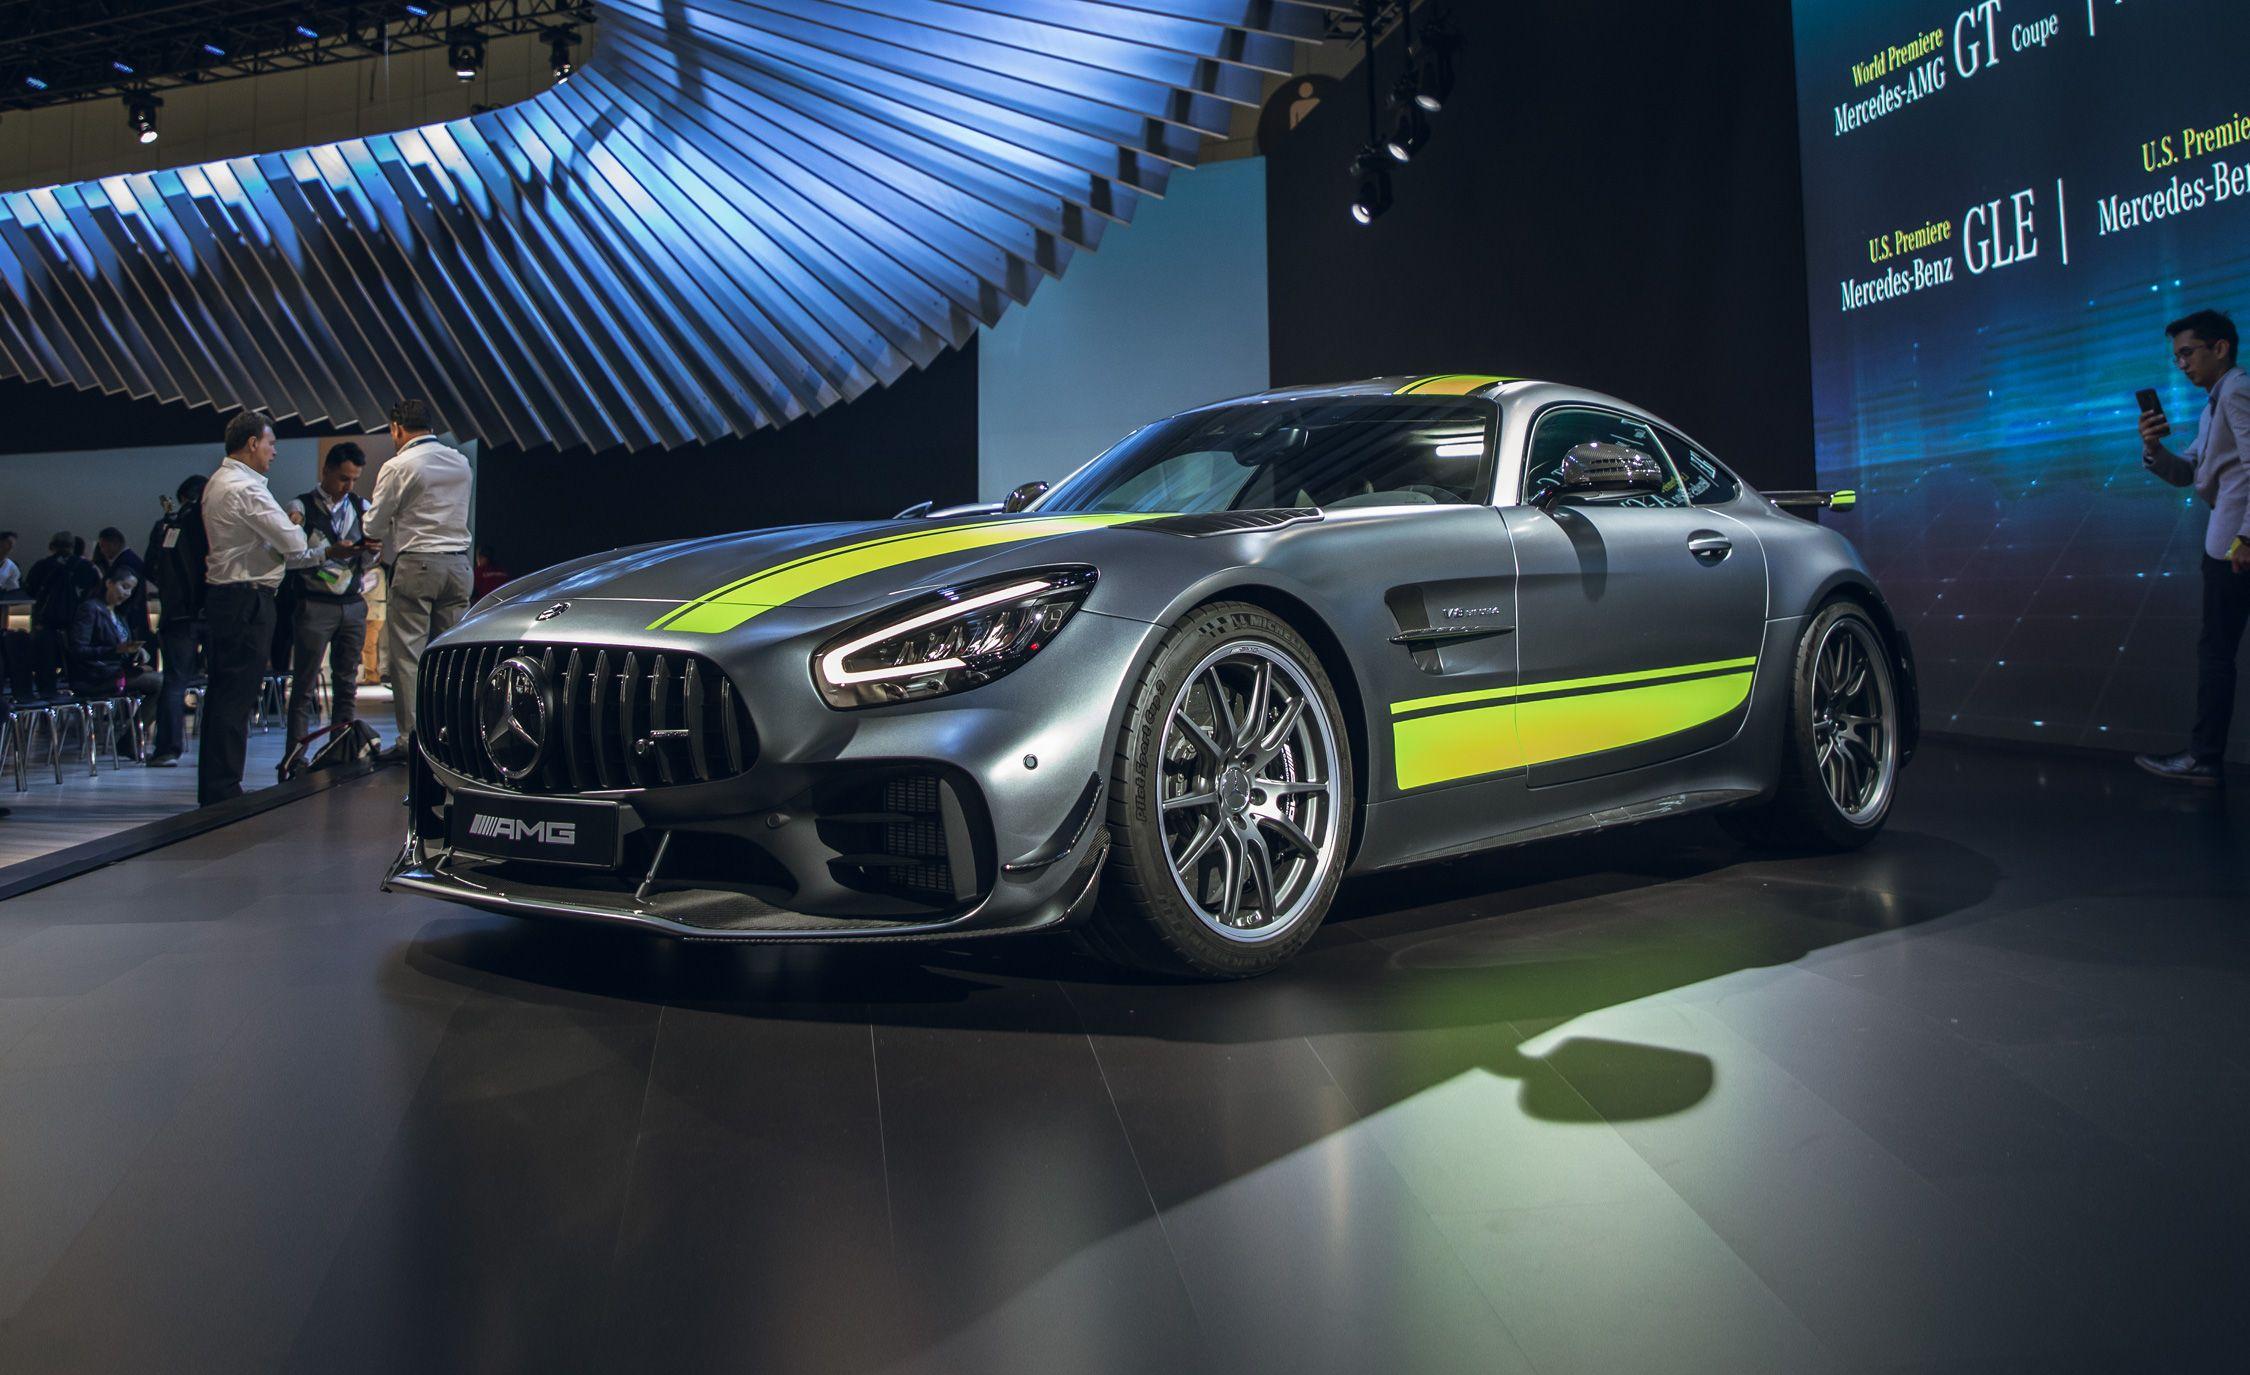 2020 Mercedes Amg Gt C Gt C Roadster Gt R Reviews Mercedes Amg